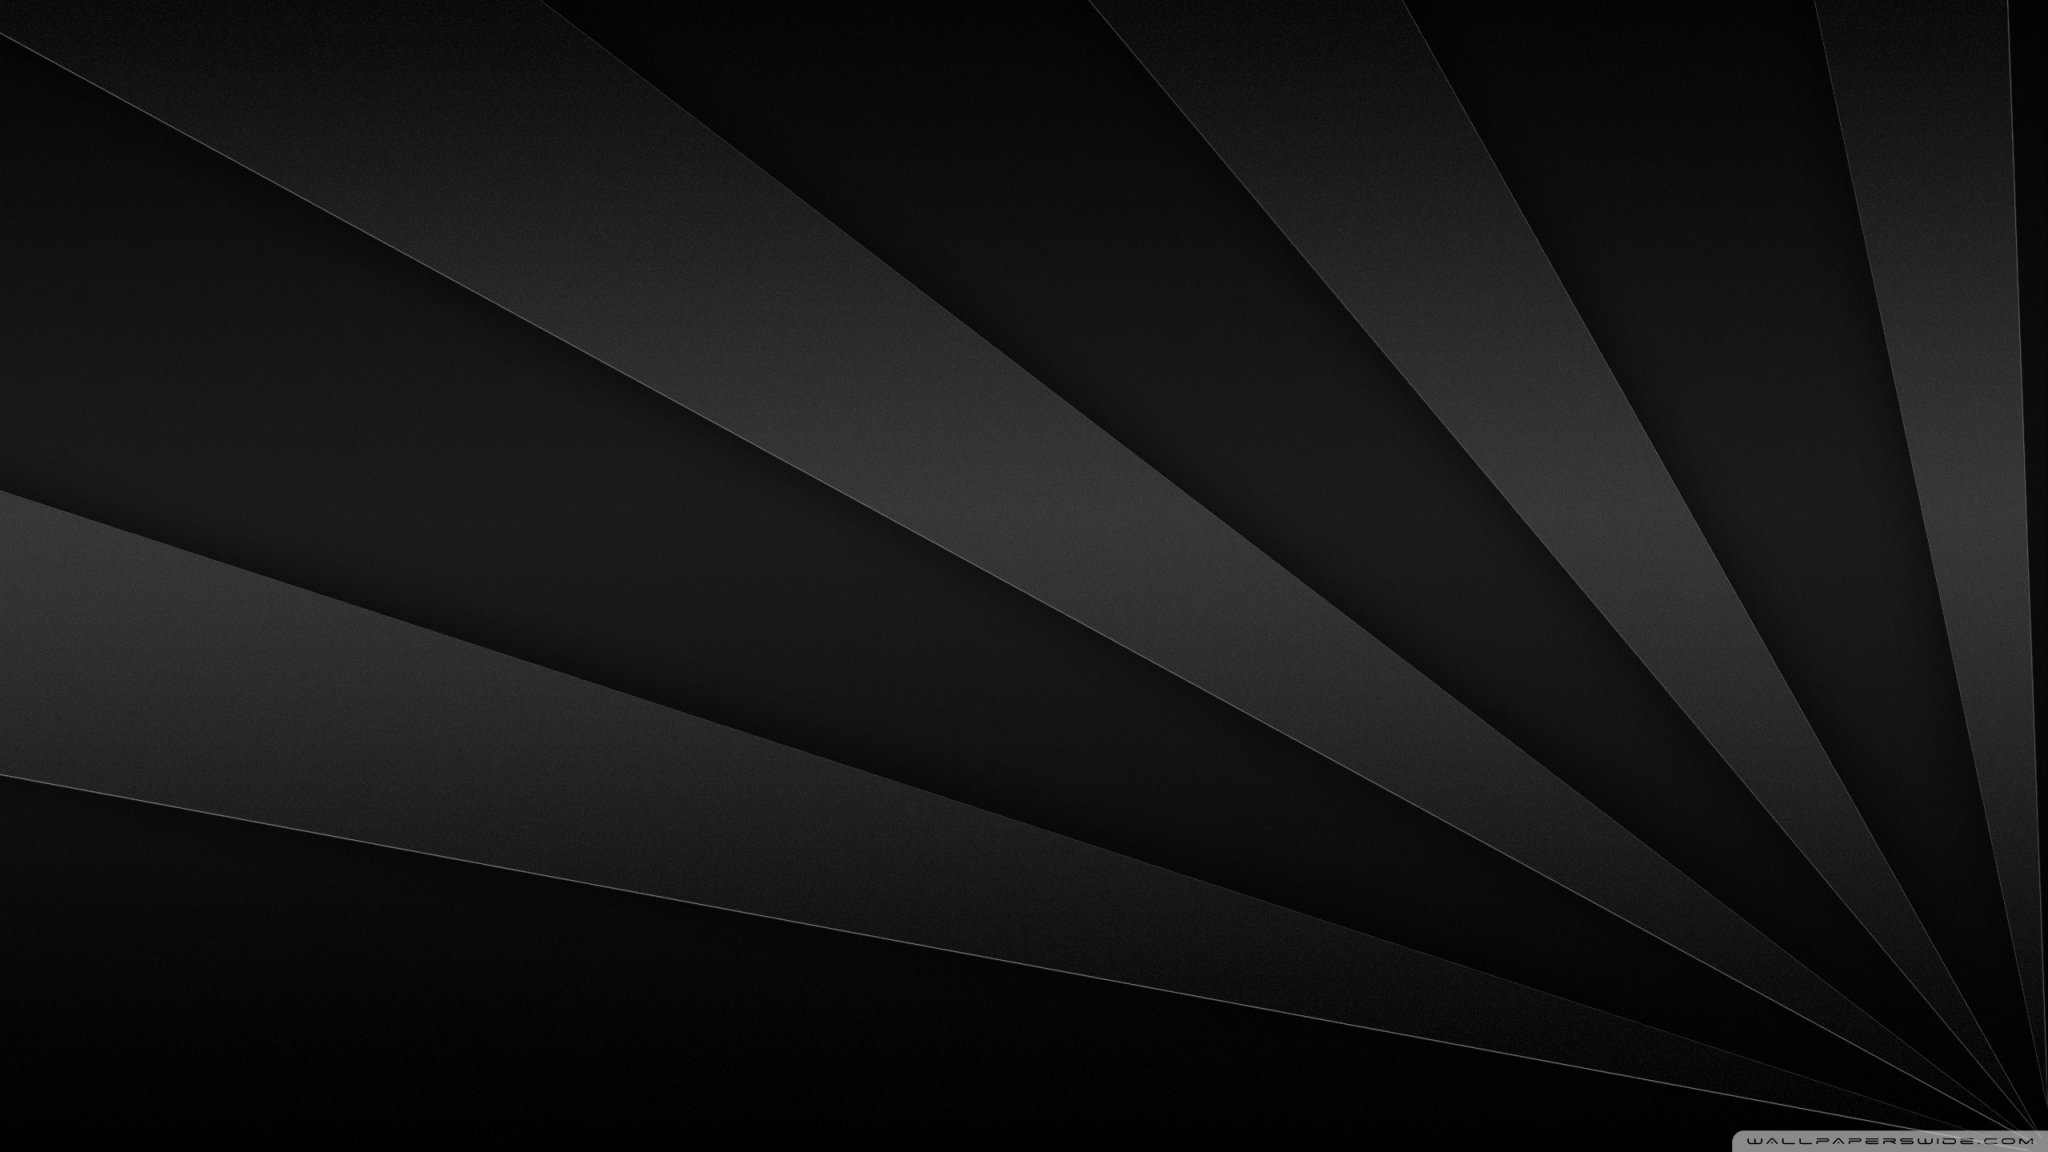 2048x1152 White for Pinterest Images For 2048x1152 Background Black 2048x1152